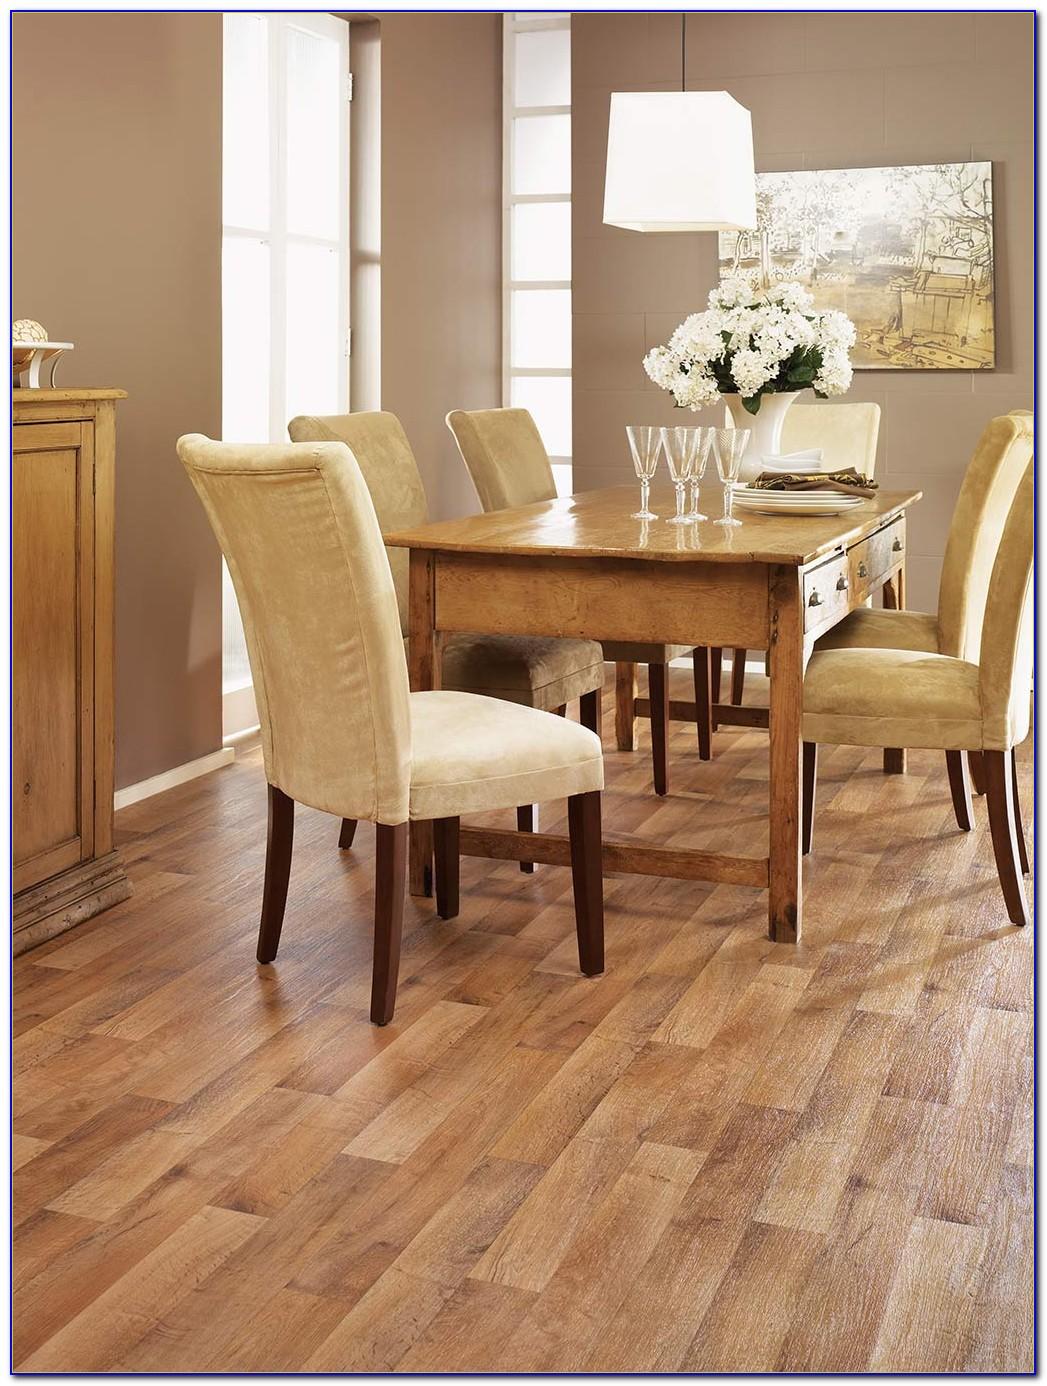 High End Laminate Flooring Vs Hardwood